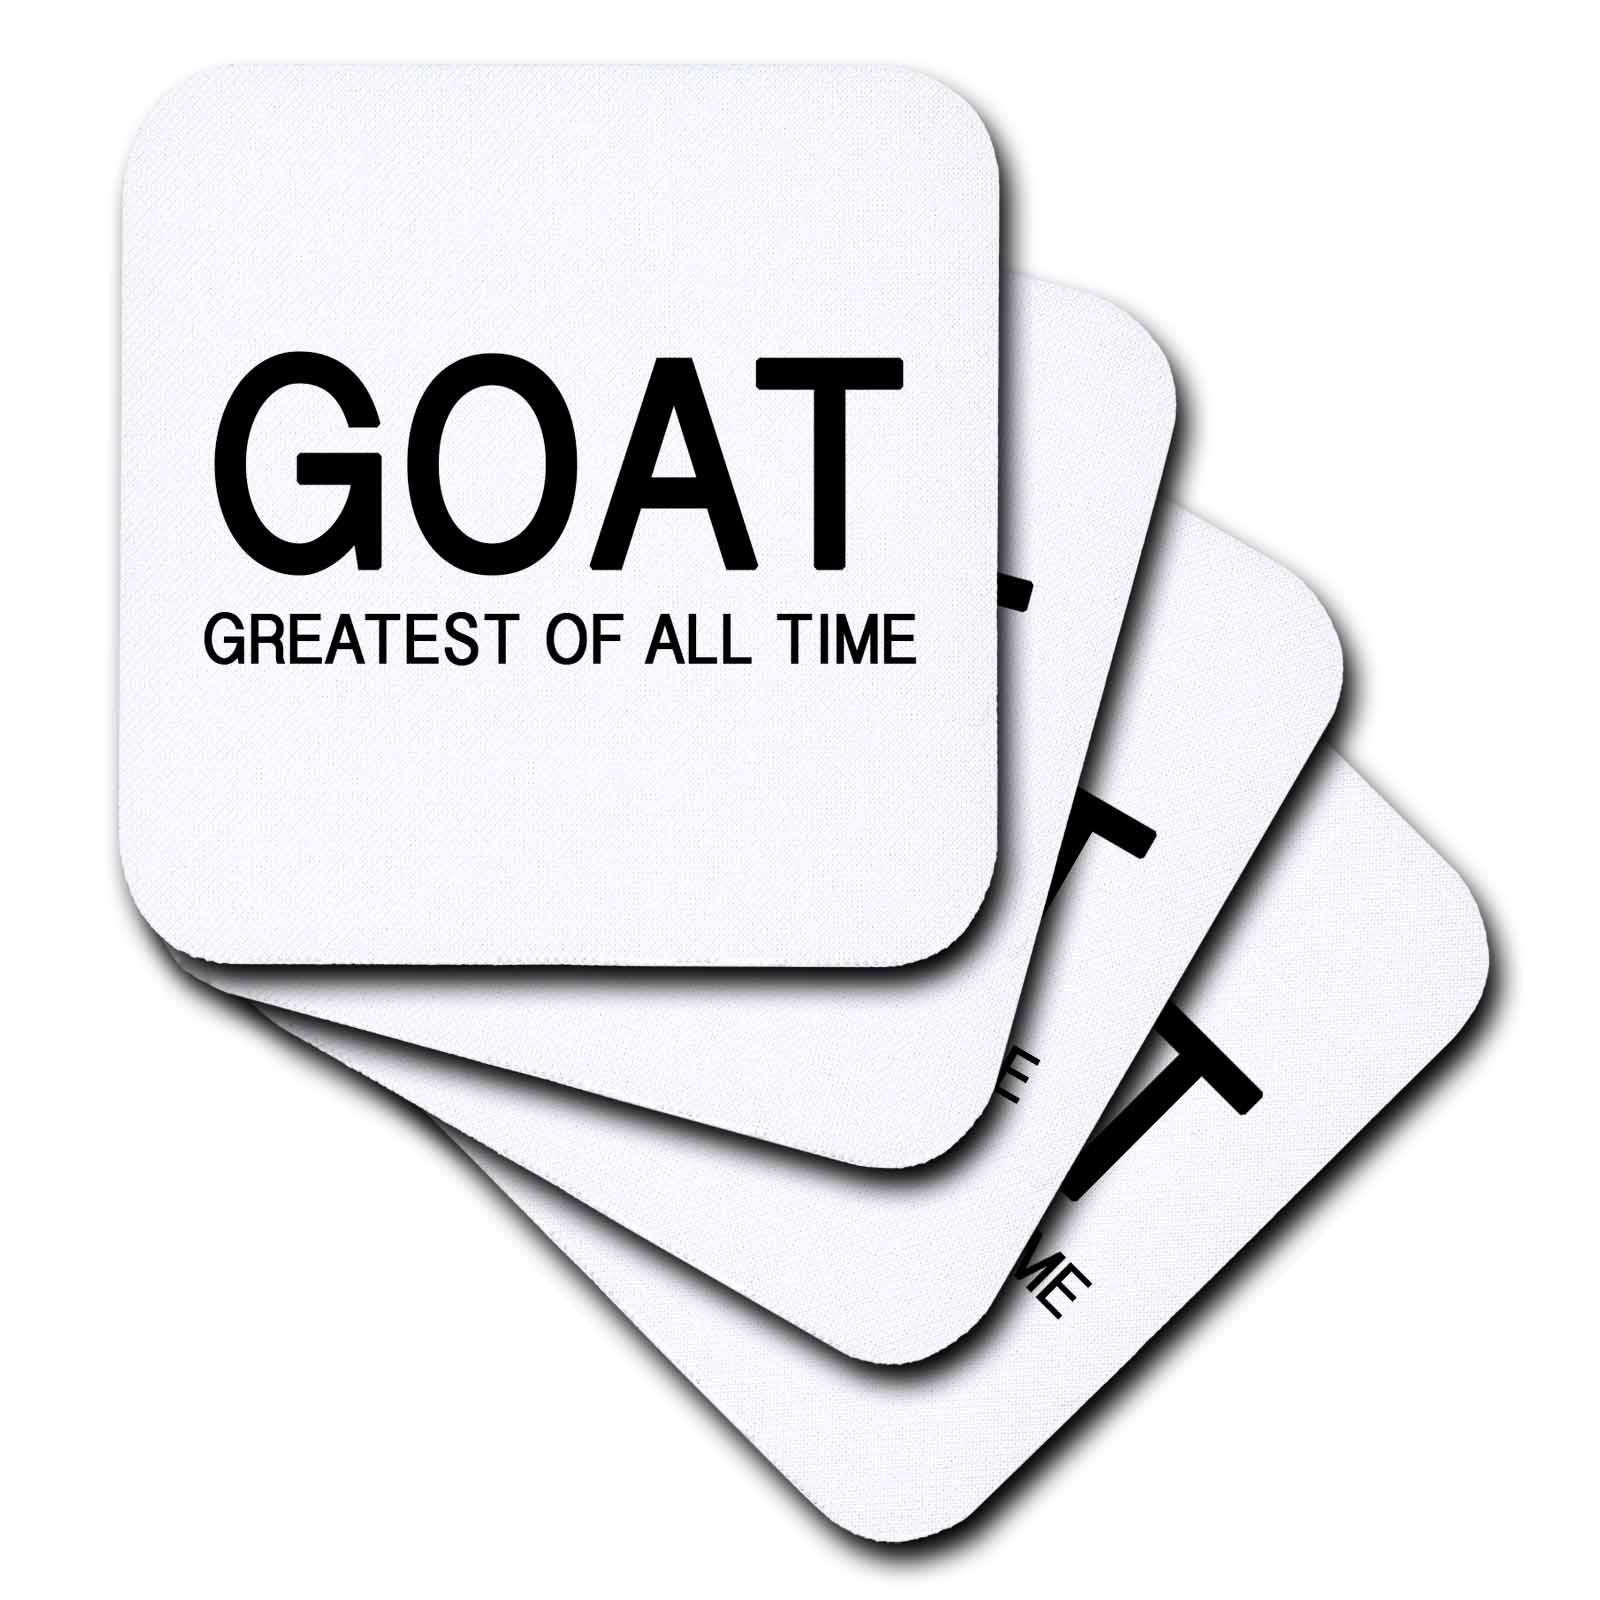 3drose goat greatest of